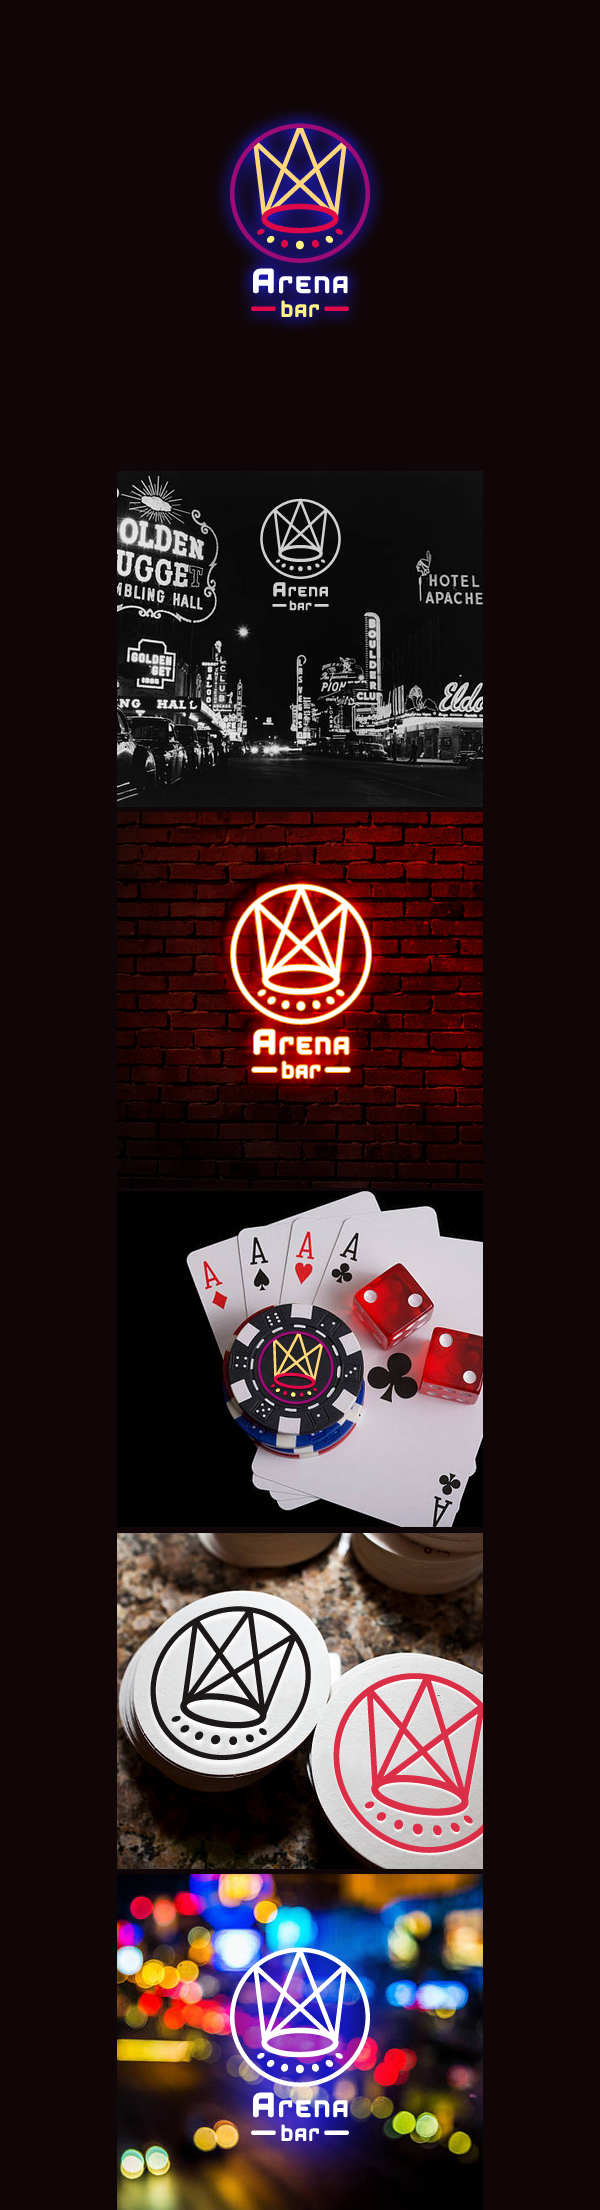 Разработка логотипа для бара! фото f_5755dcef5147bd14.png